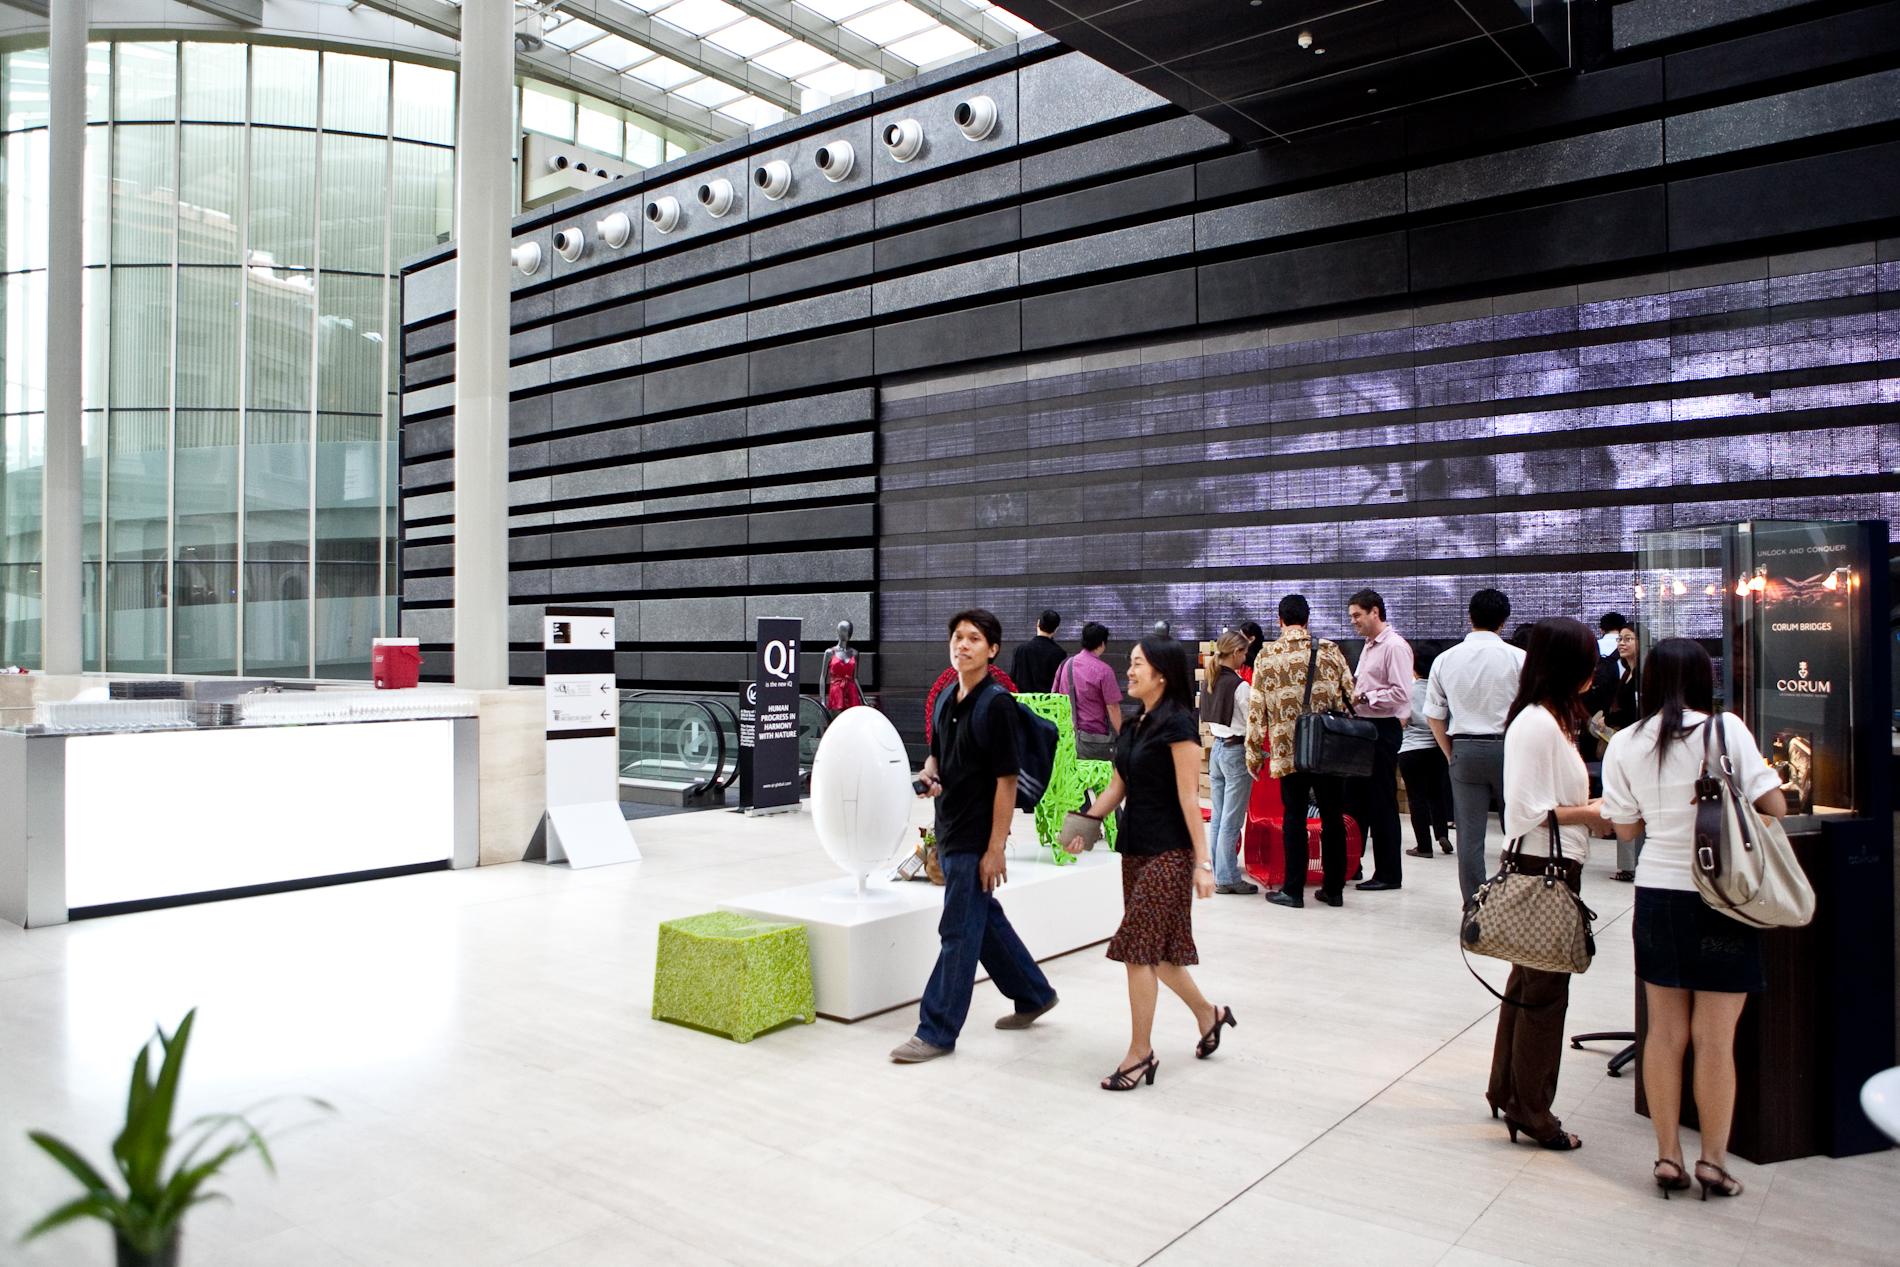 qi-global-2009-sustaible-design-singapore-038.jpg